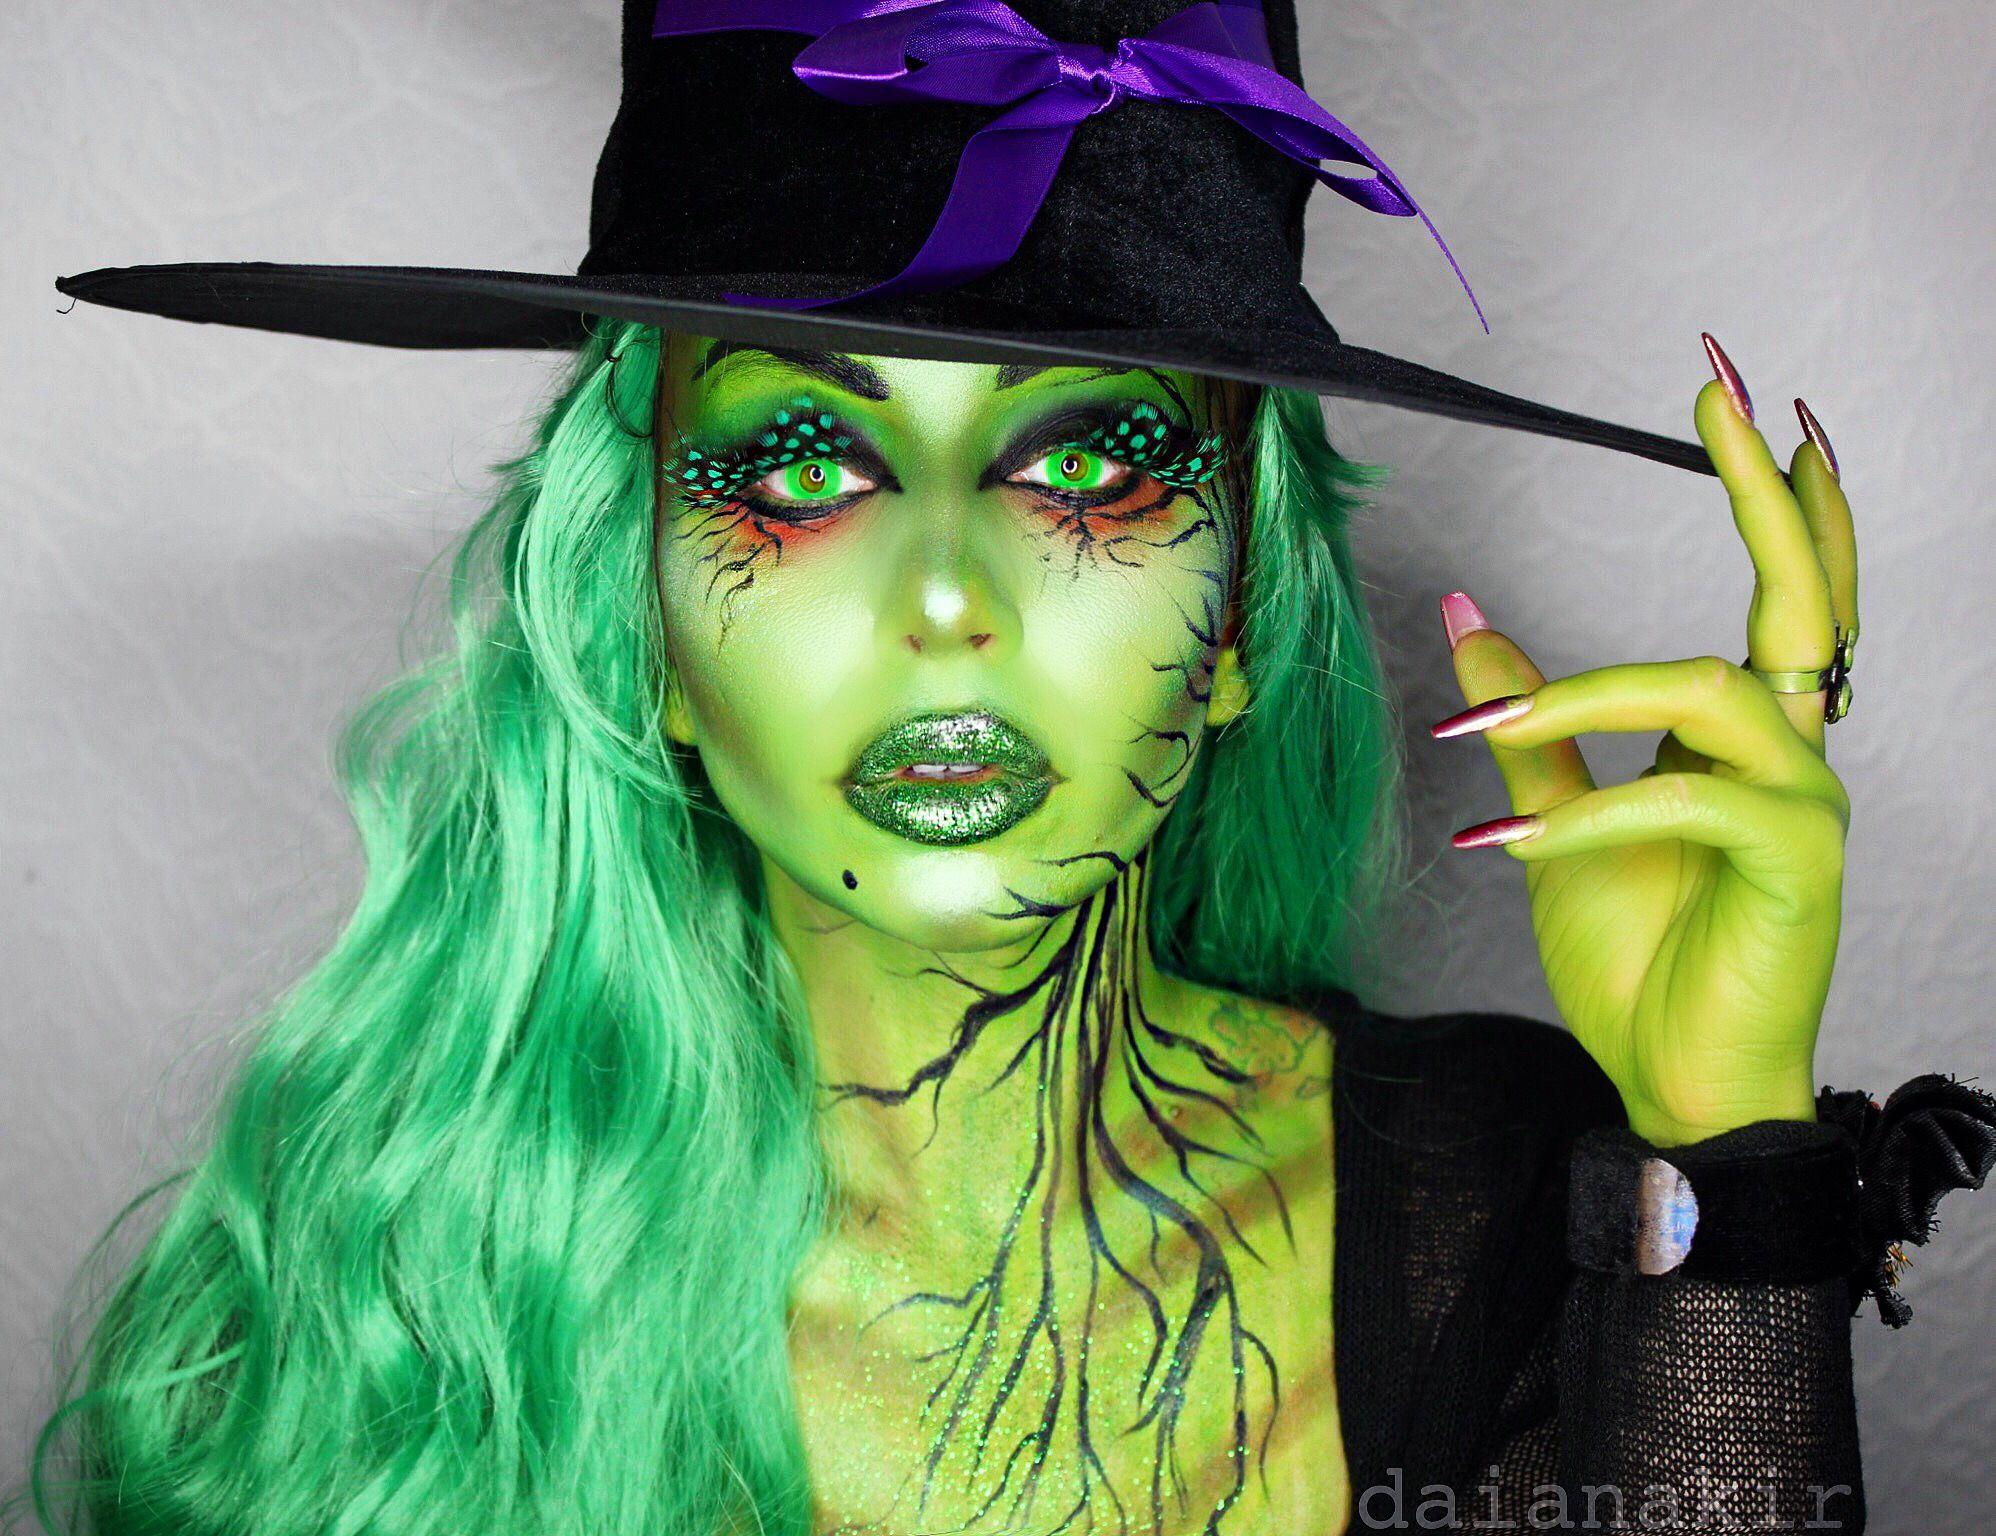 Wicked witch halloween makeup costume tutorial and story here wicked witch halloween makeup costume tutorial and story here httpsyoutu baditri Images